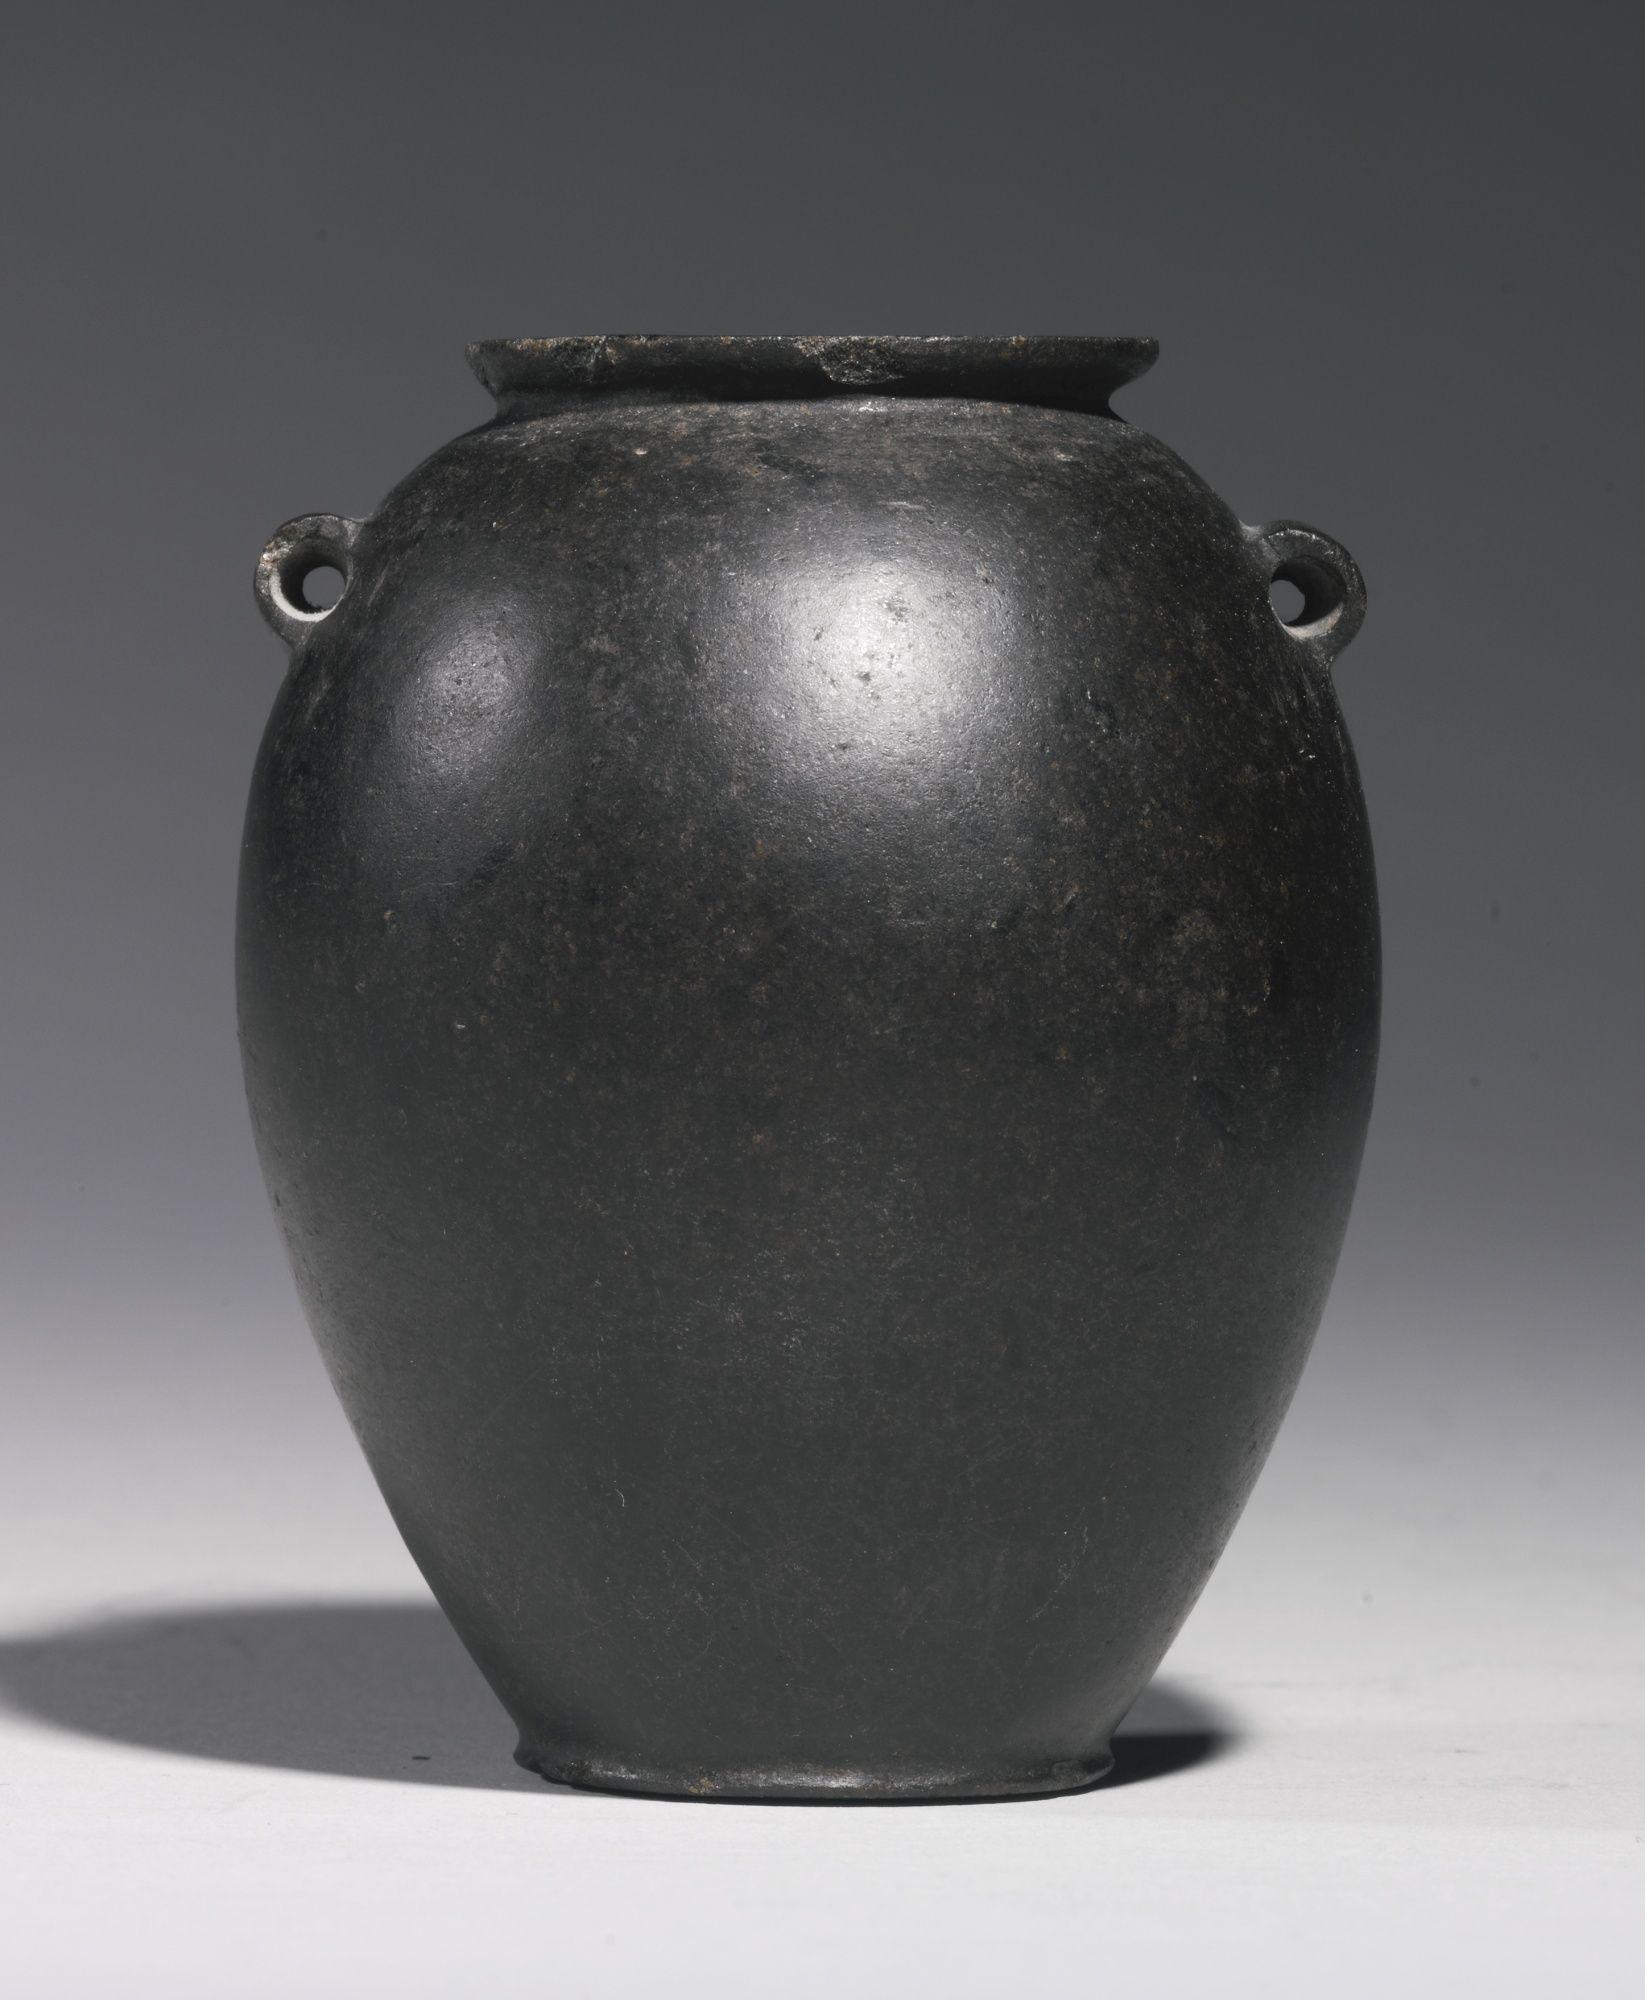 An Egyptian Black Basalt Jar Predynastic Period Nagada I 1st